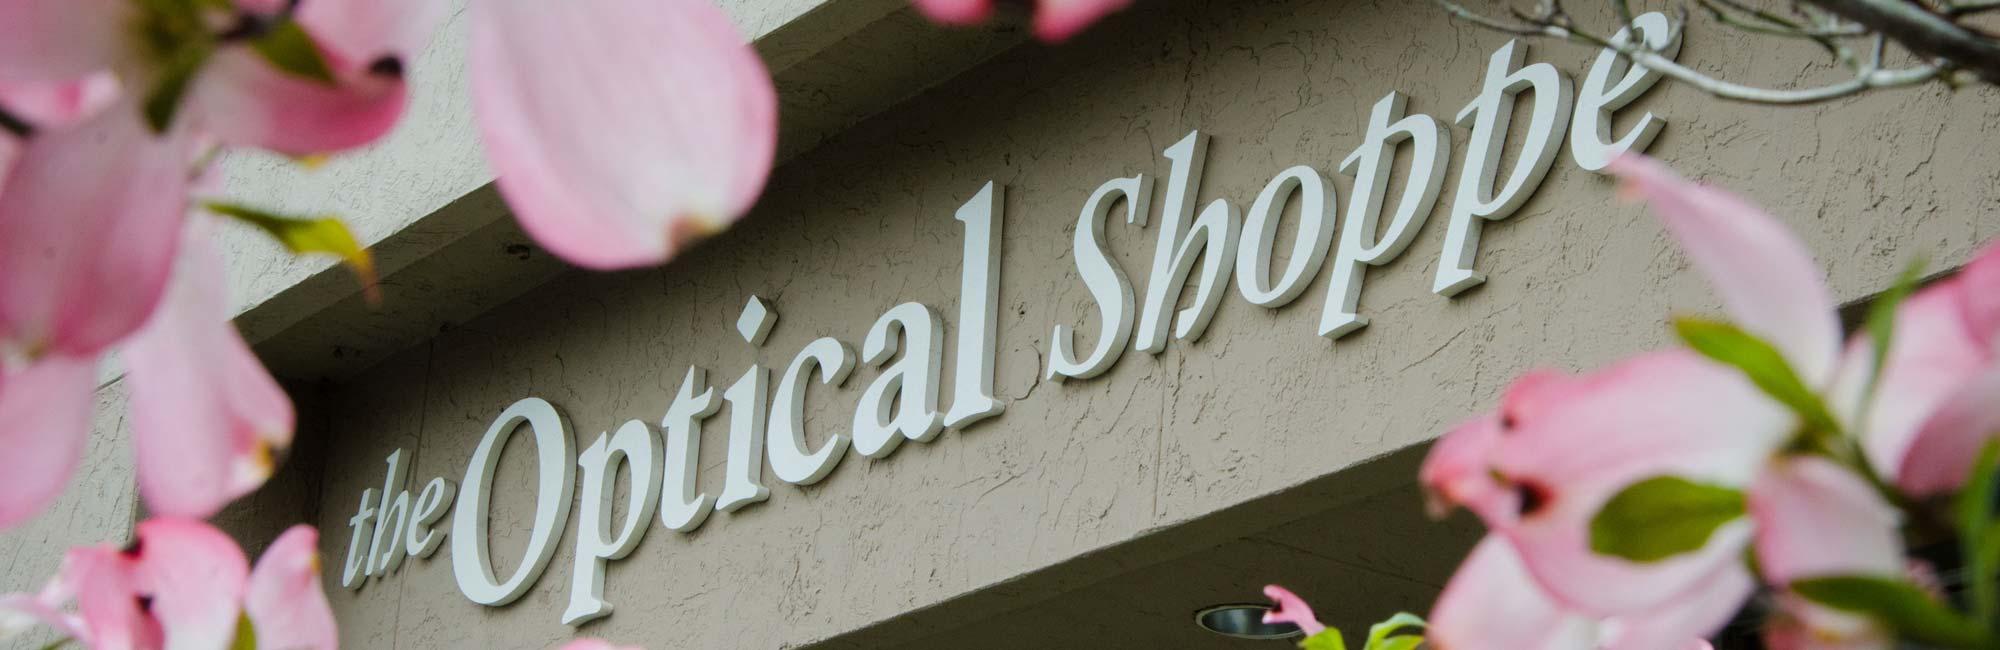 The_Optical_Shoppe_Asheville_NC